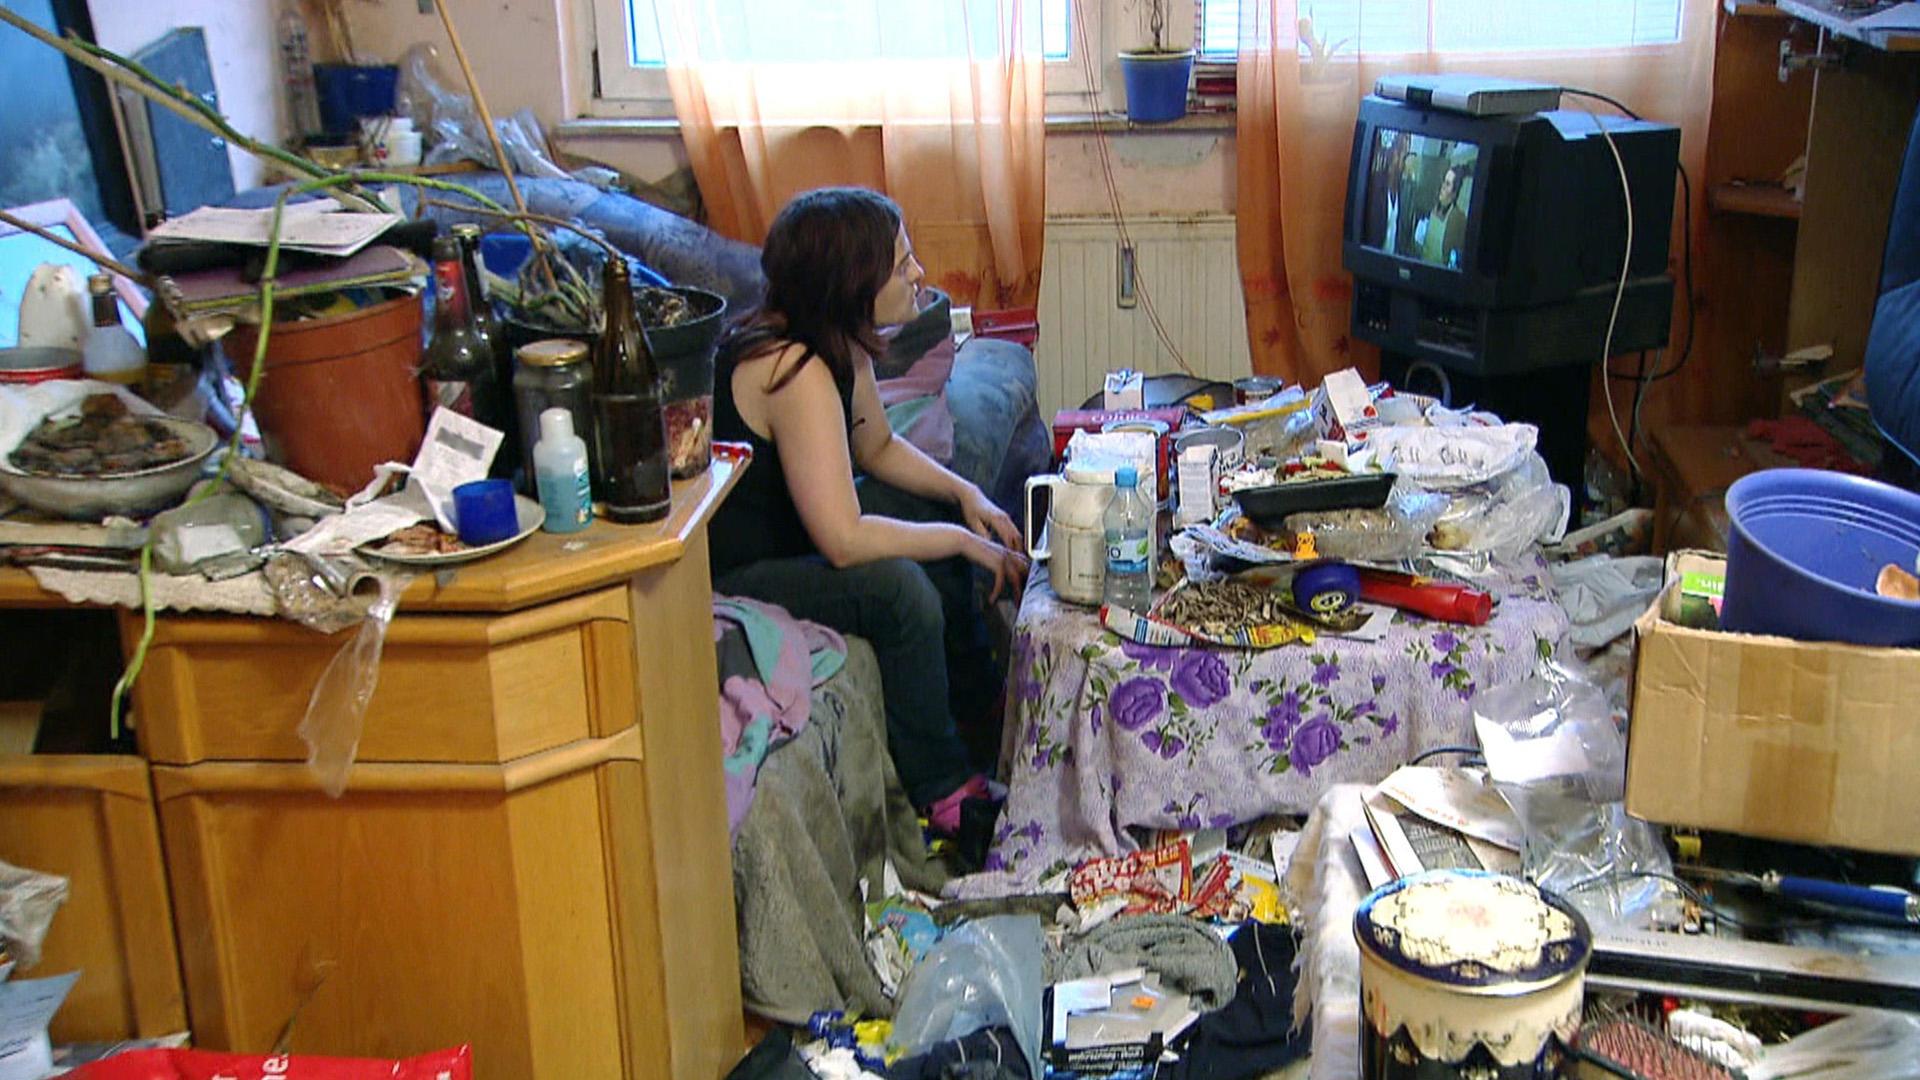 Daniela lebt in großer Verwahrlosung | Folge 12